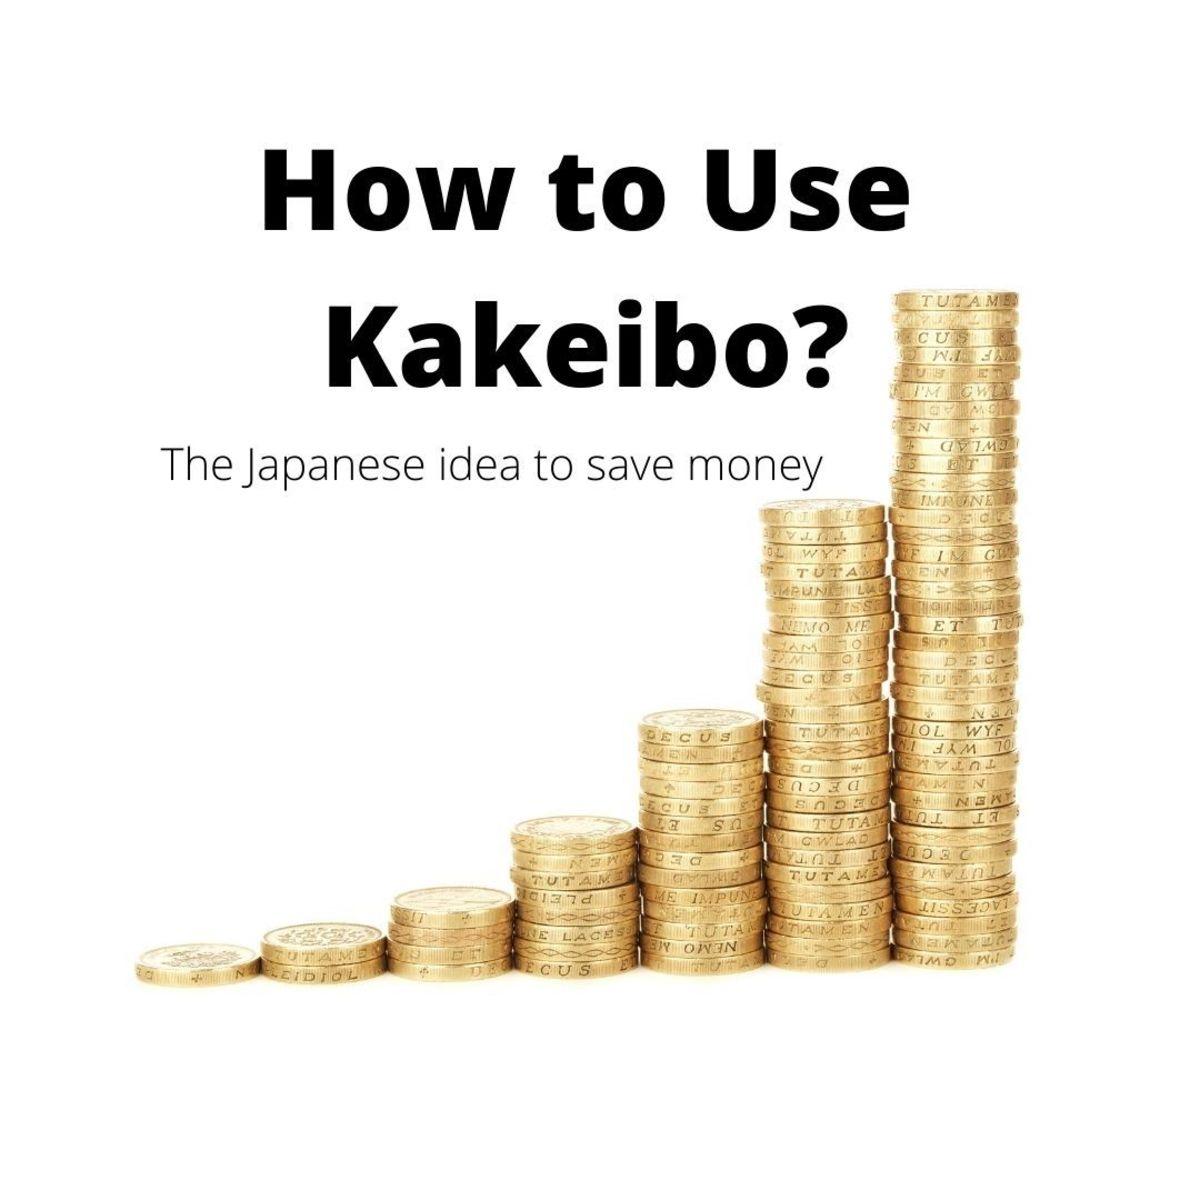 Kakeibo is the Japanese budgeting method to save money.